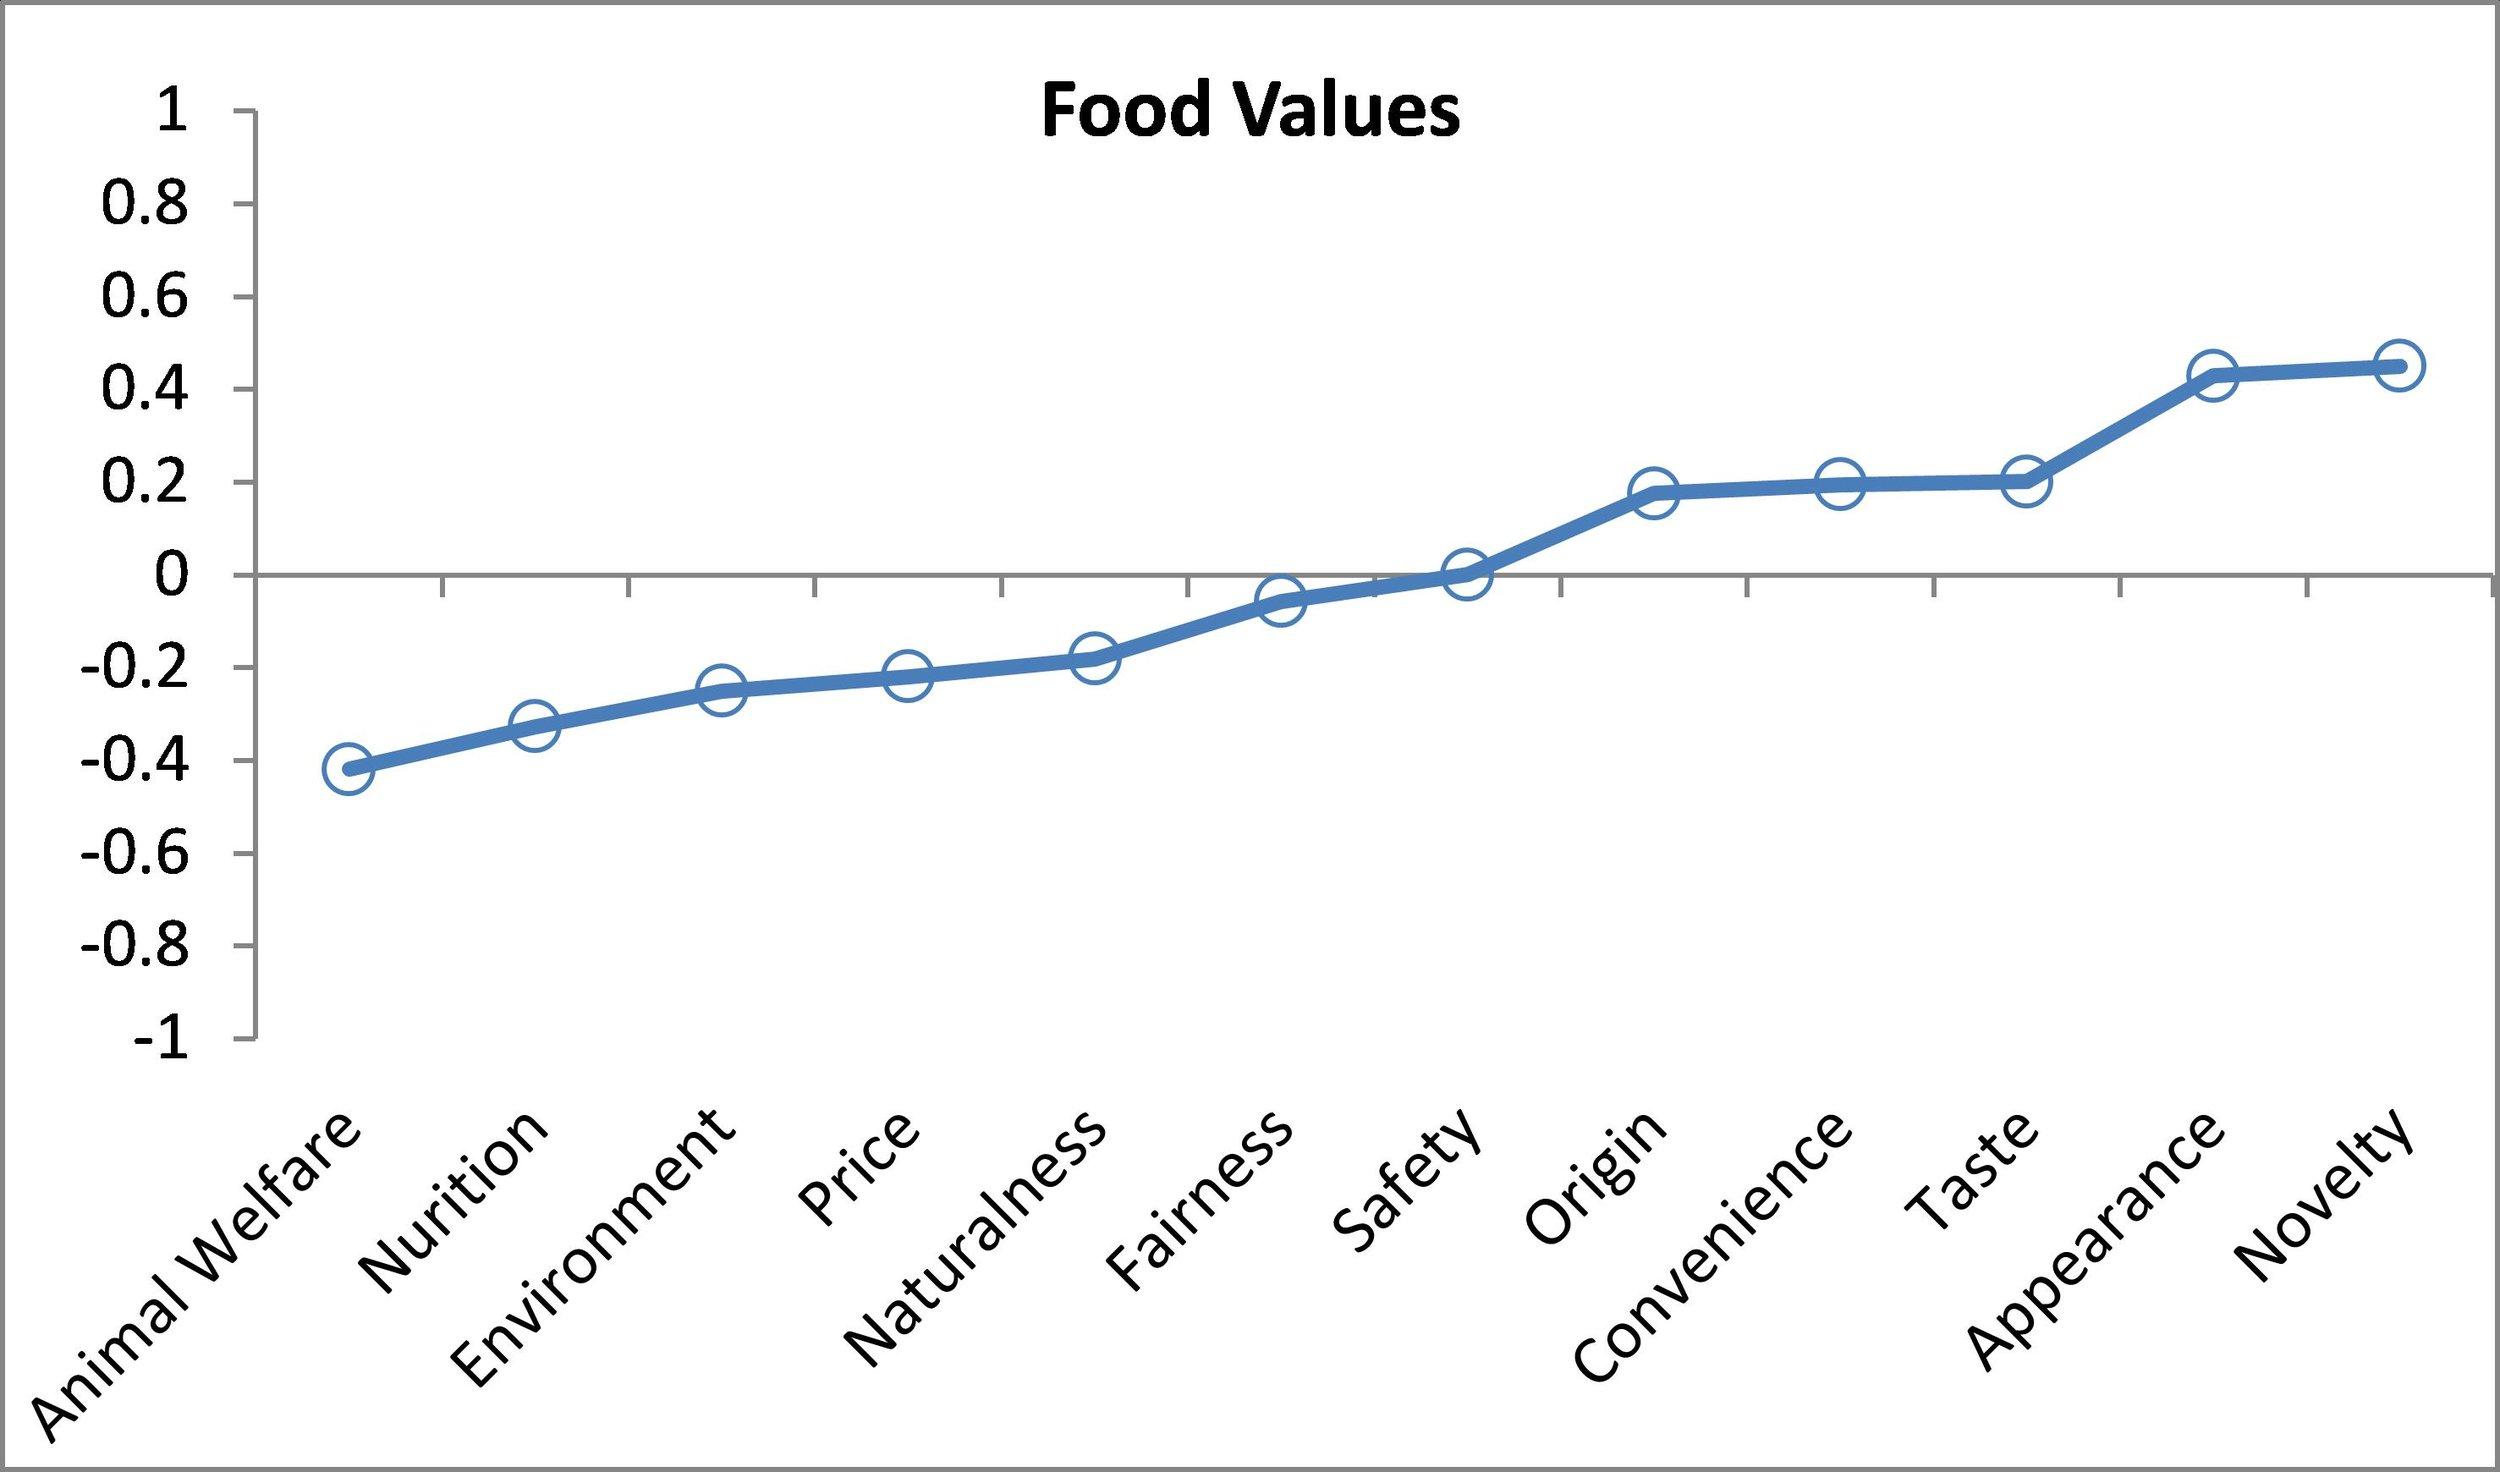 Relationship between food values and steak demand